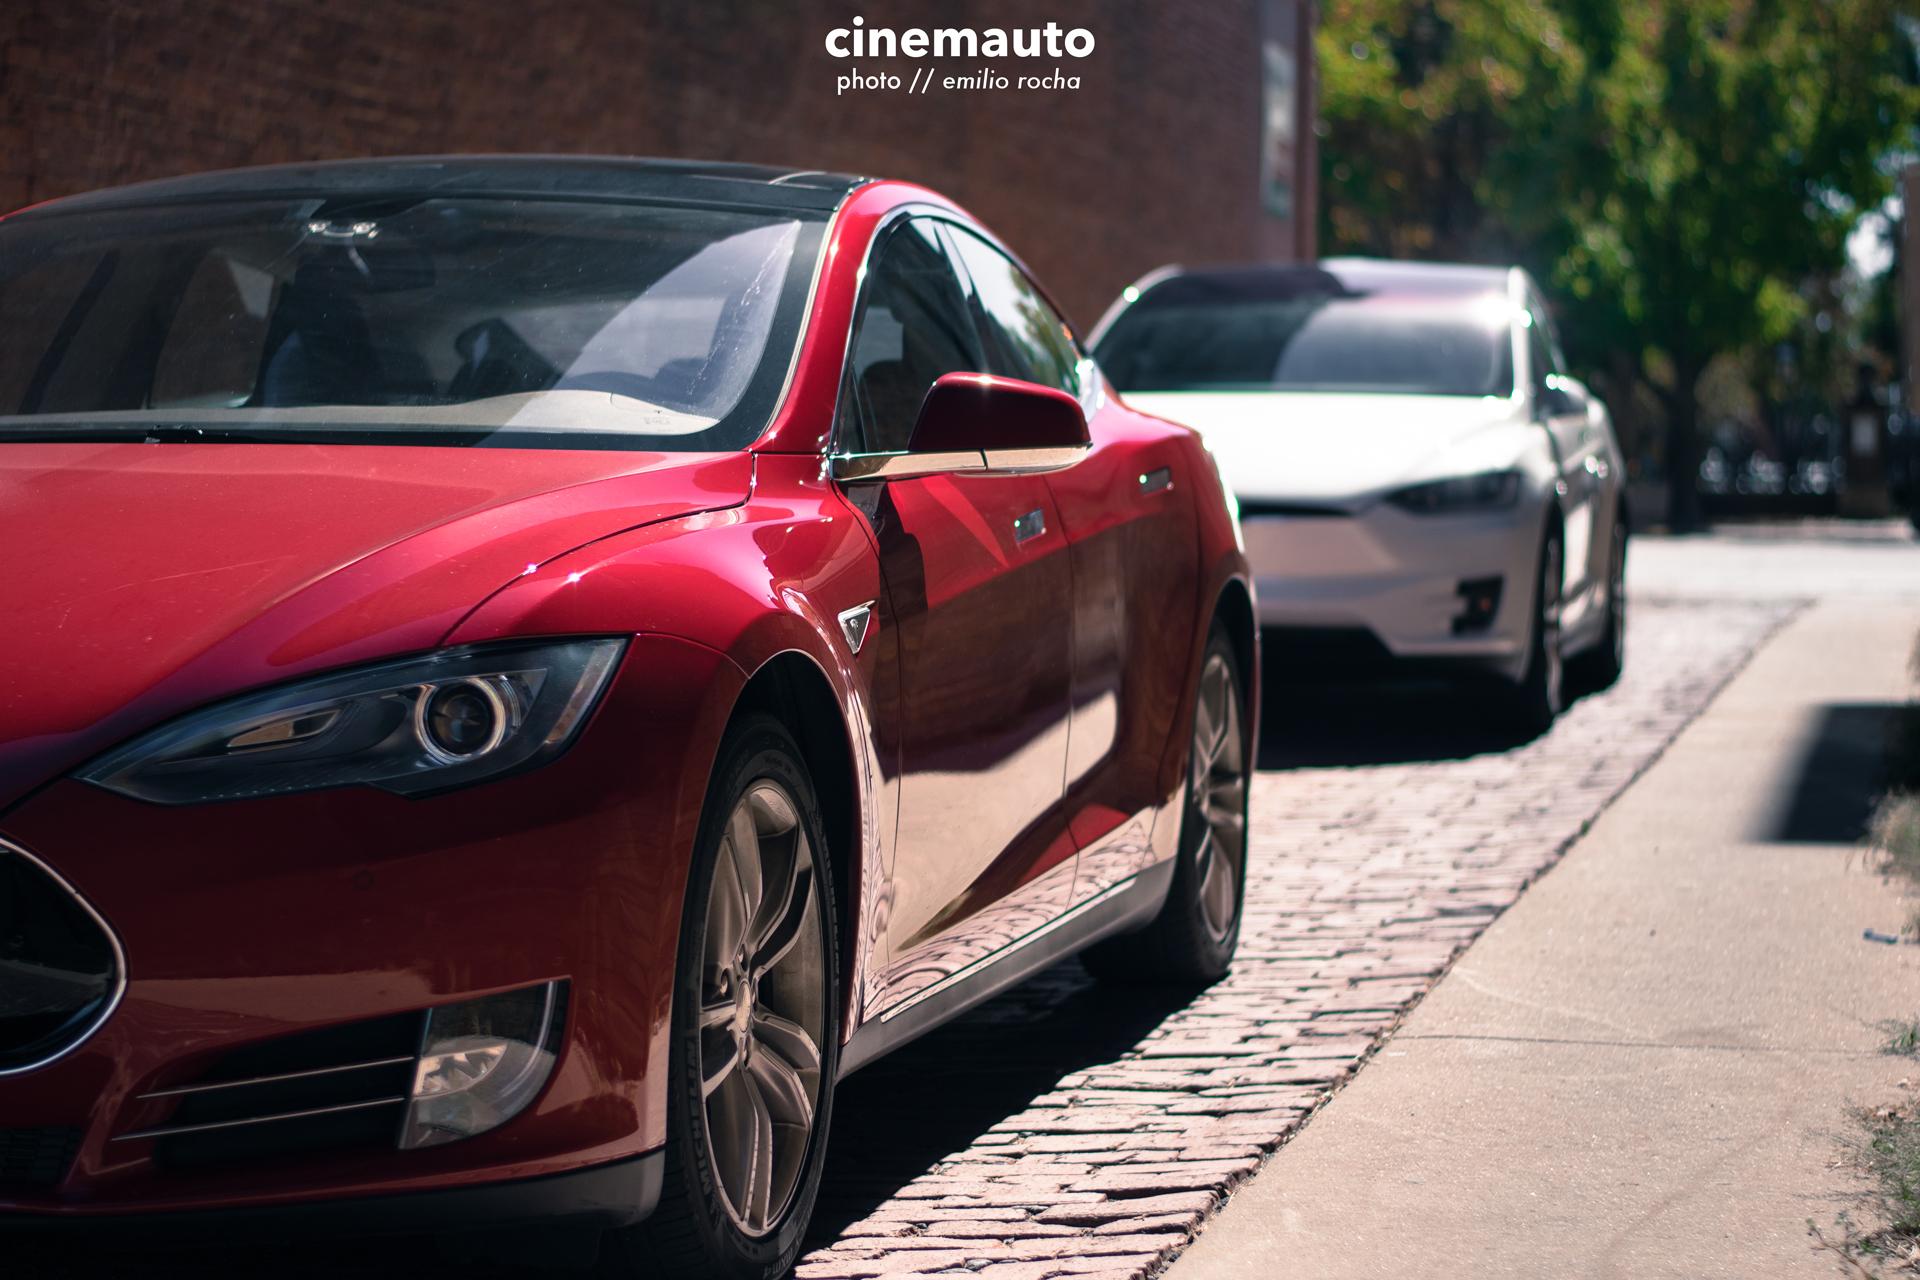 TeslaCinemauto-24.jpg